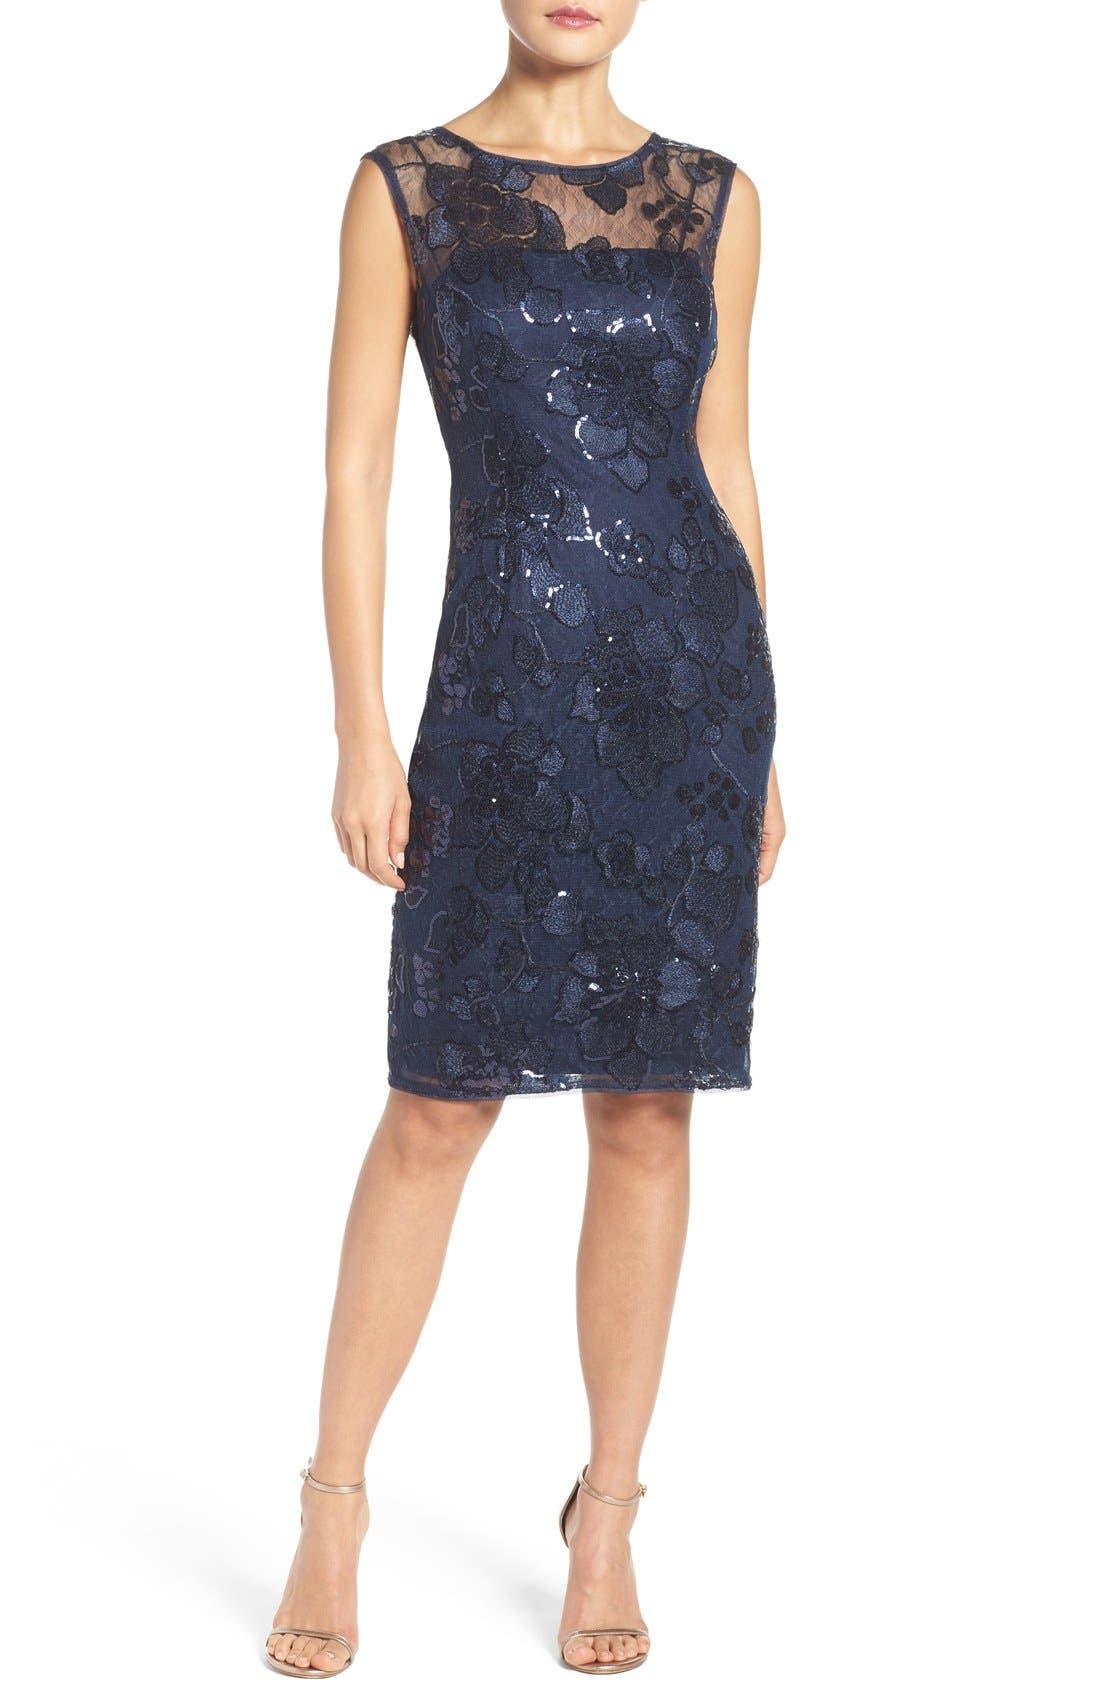 Alternate Image 1 Selected - Adrianna Papell Embellished Lace Sheath Dress